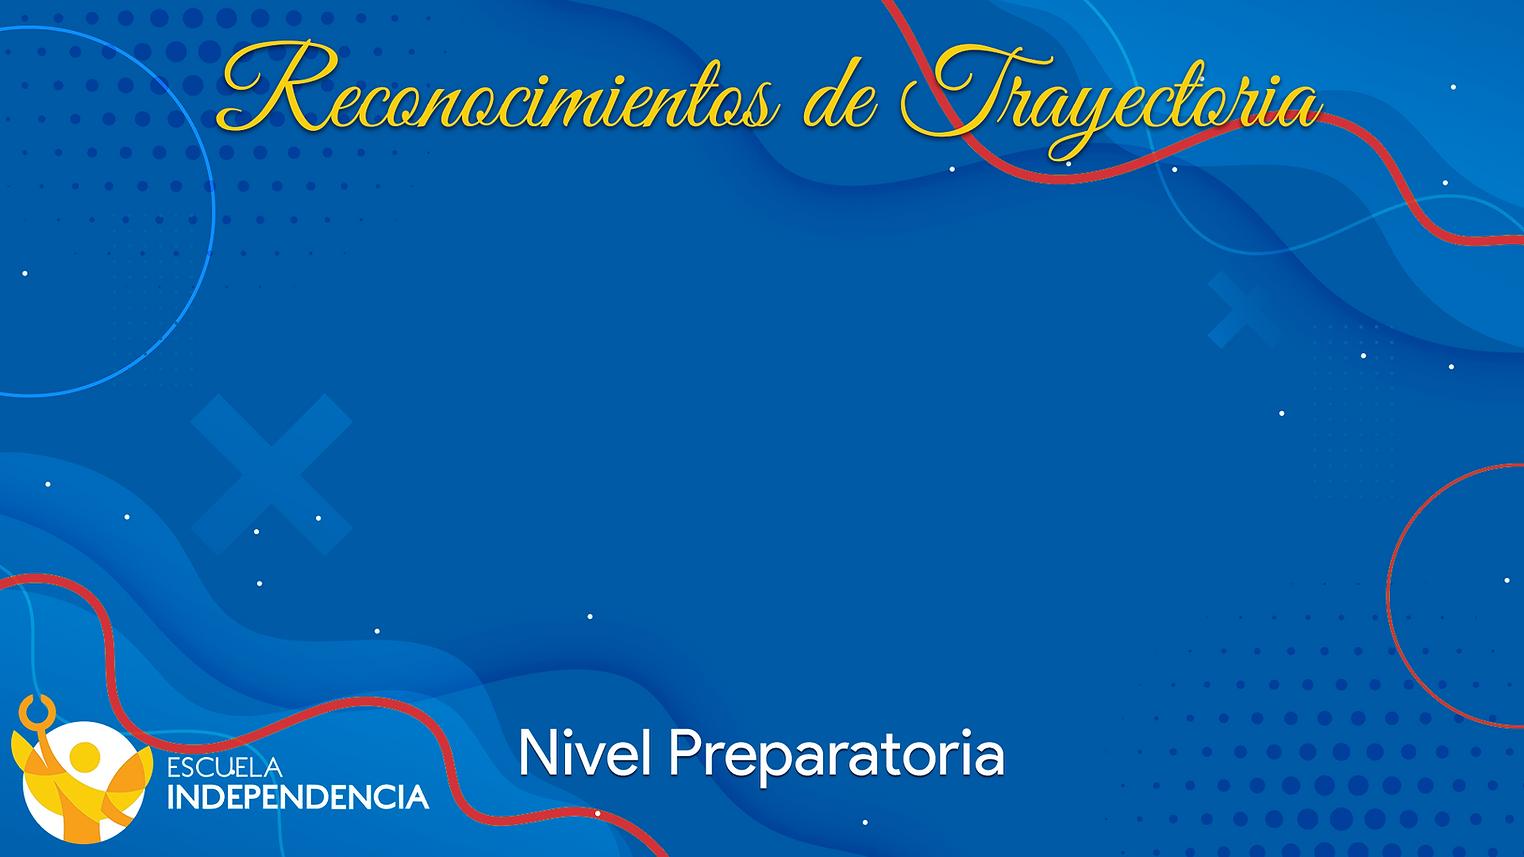 Fondo Trayectoria Prepa.png